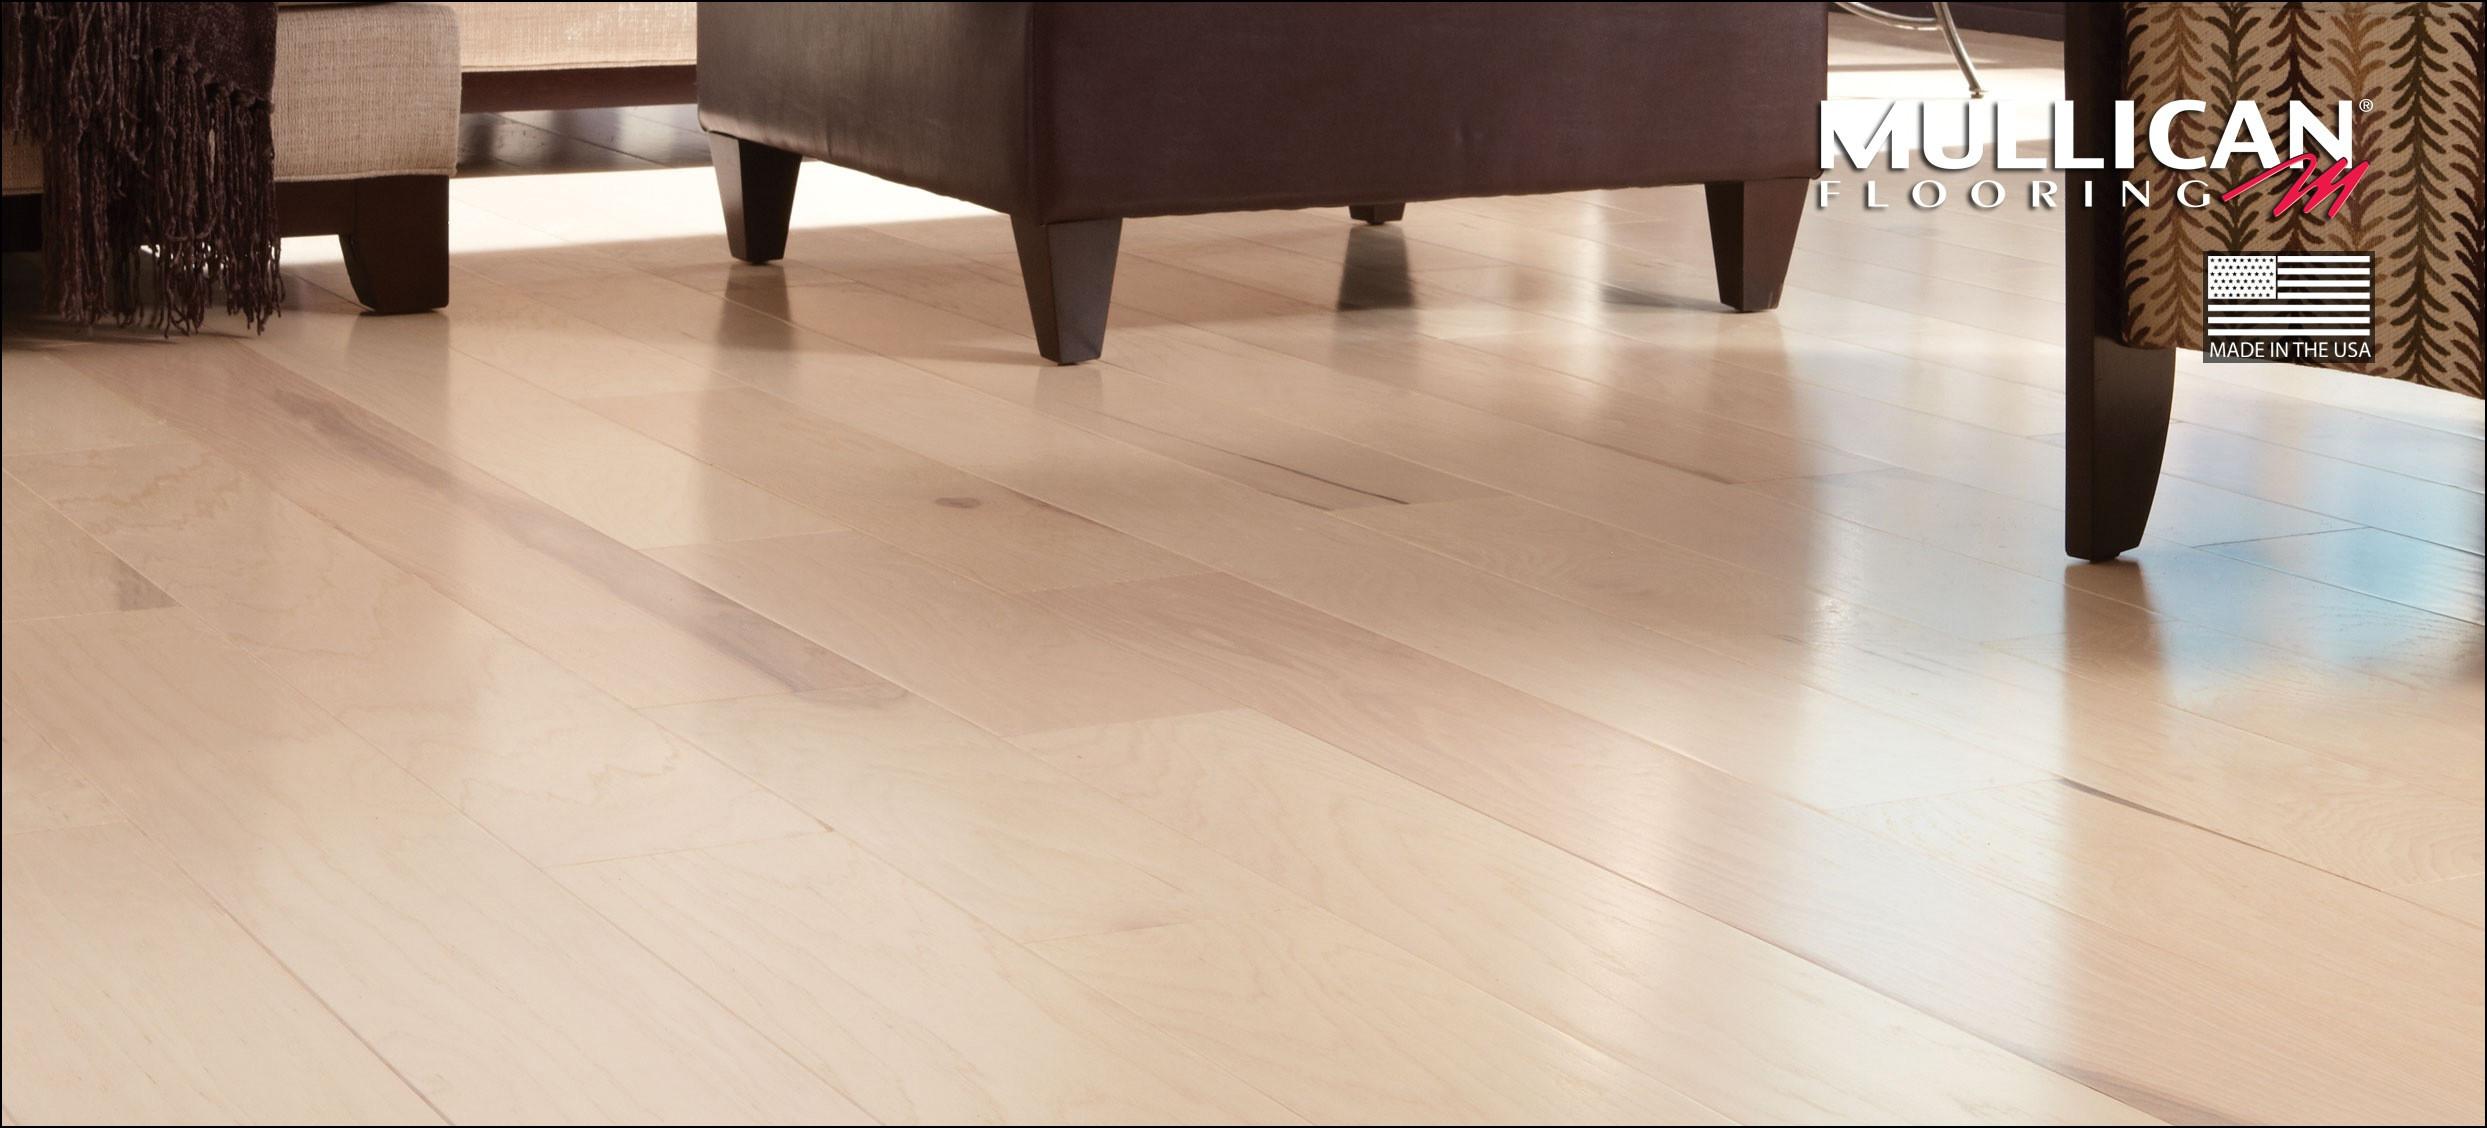 higgins hardwood flooring reviews of hardwood flooring suppliers france flooring ideas intended for hardwood flooring installation san diego mullican flooring home of hardwood flooring installation san diego